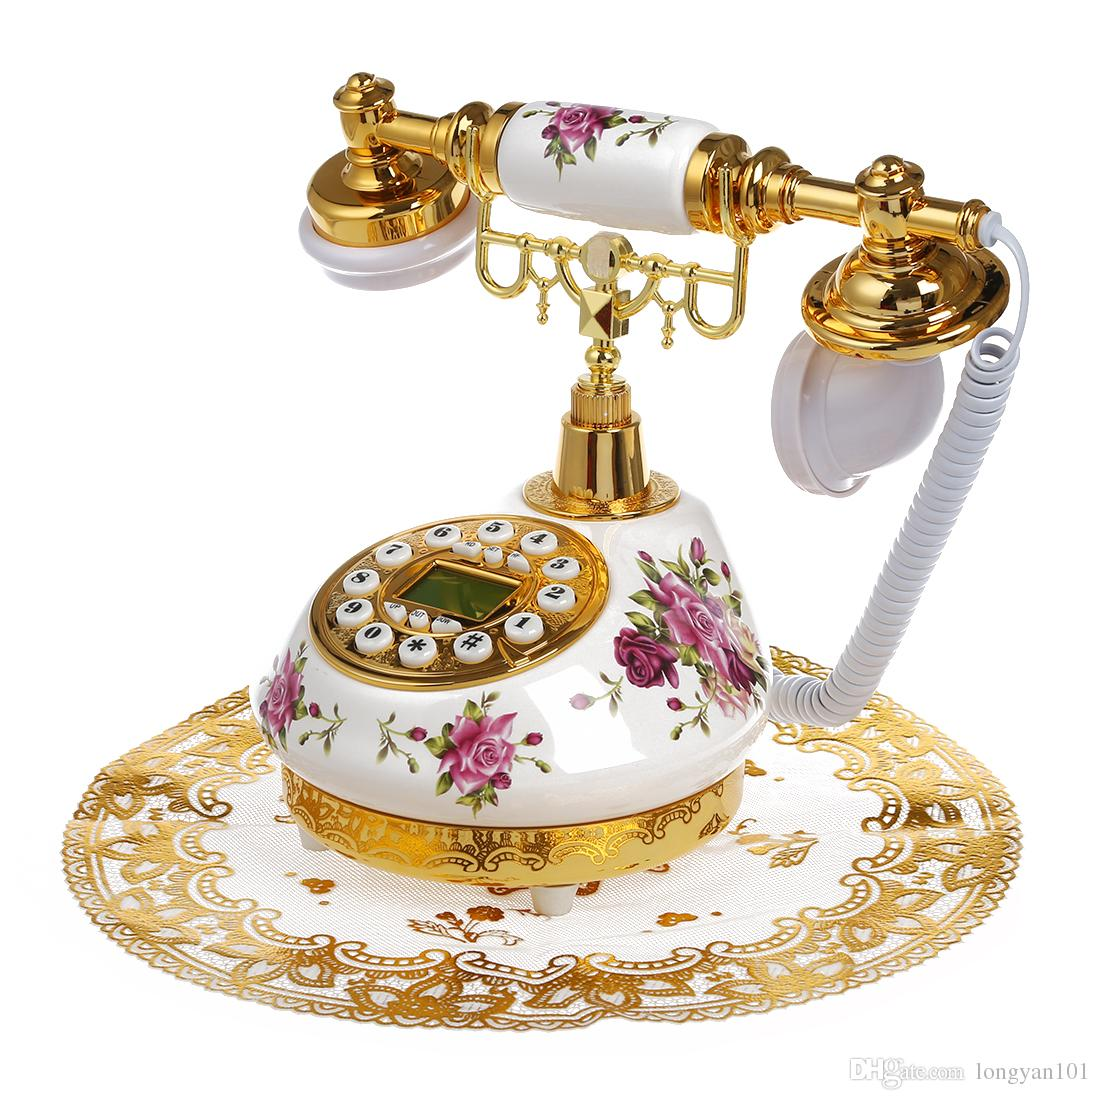 Retro Vintage Antique Style Fl Ceramic Home Decor Desk Telephone Phone Red Digital From Longyan101 60 3 Dhgate Com